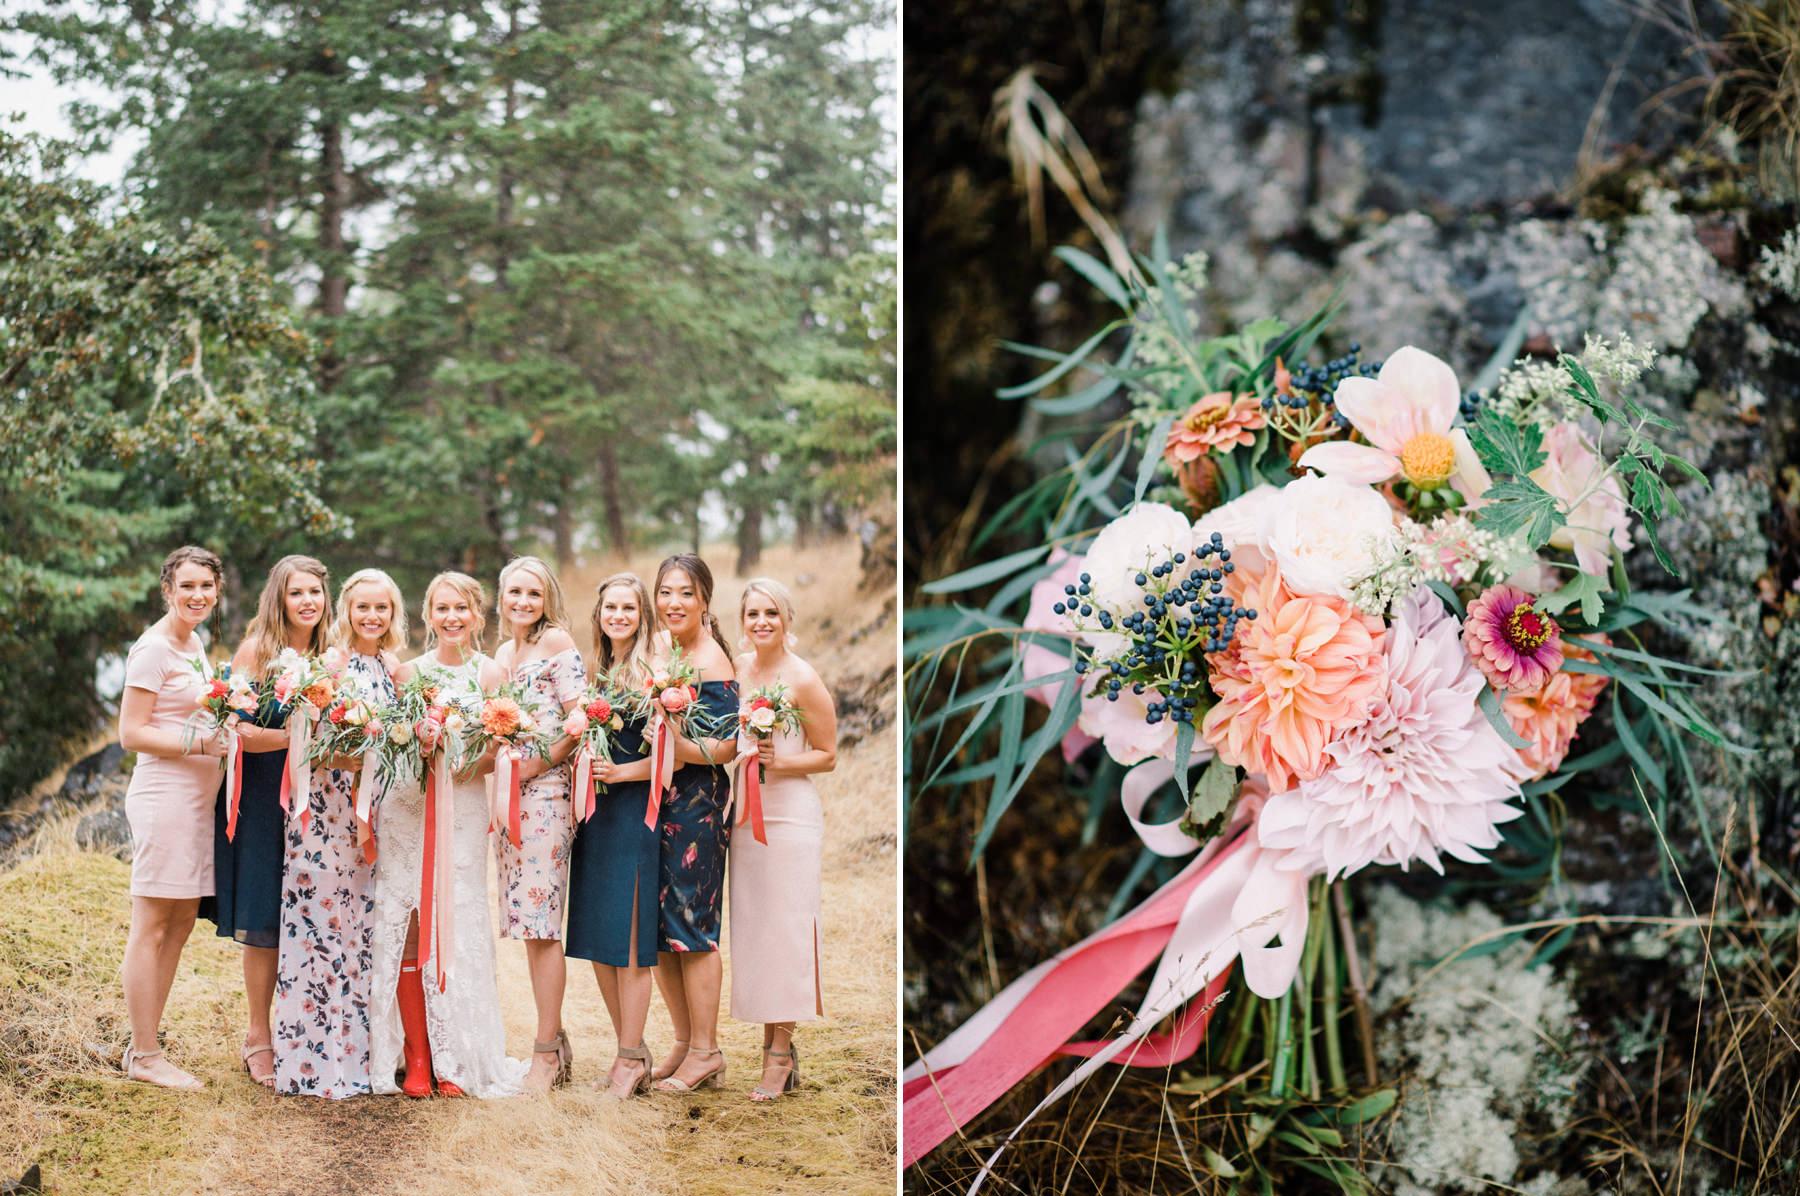 306-colorful-outdoor-lopez-island-wedding.jpg